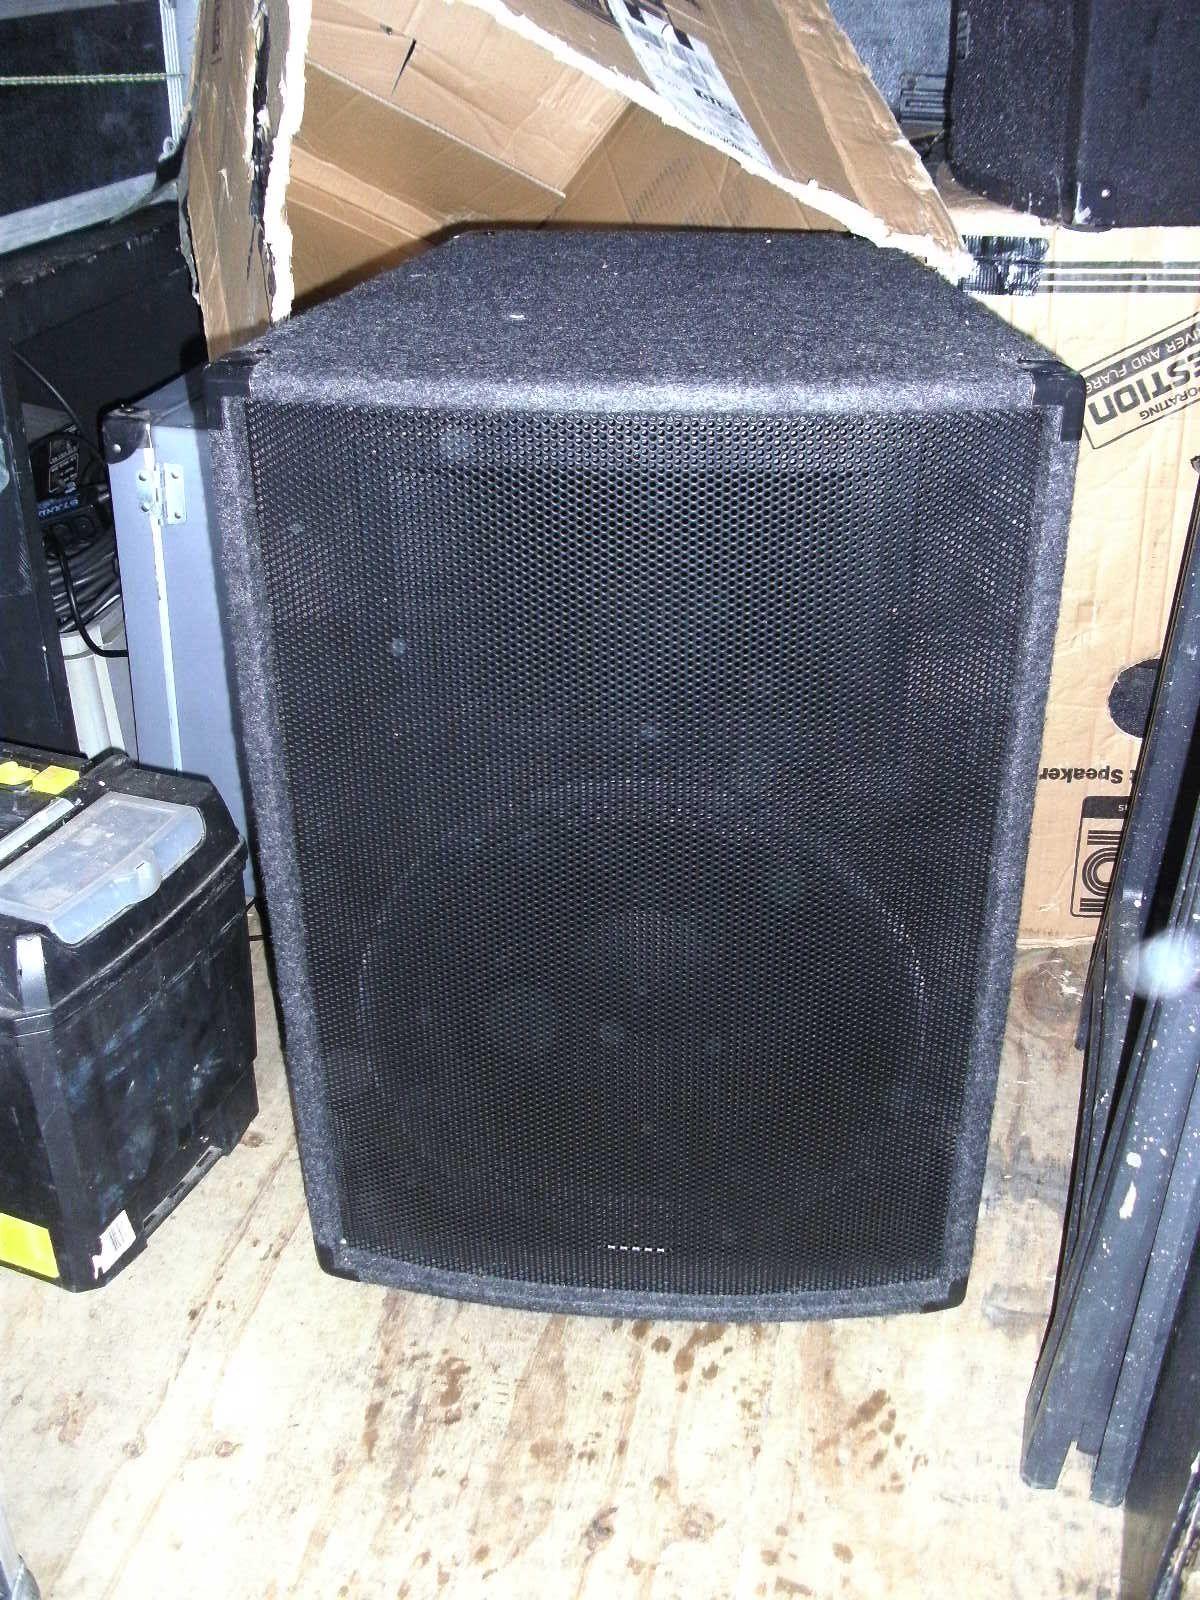 NJD Bass Bin x 2 (Always kept in their cardboard cases to keep them undamaged in transit